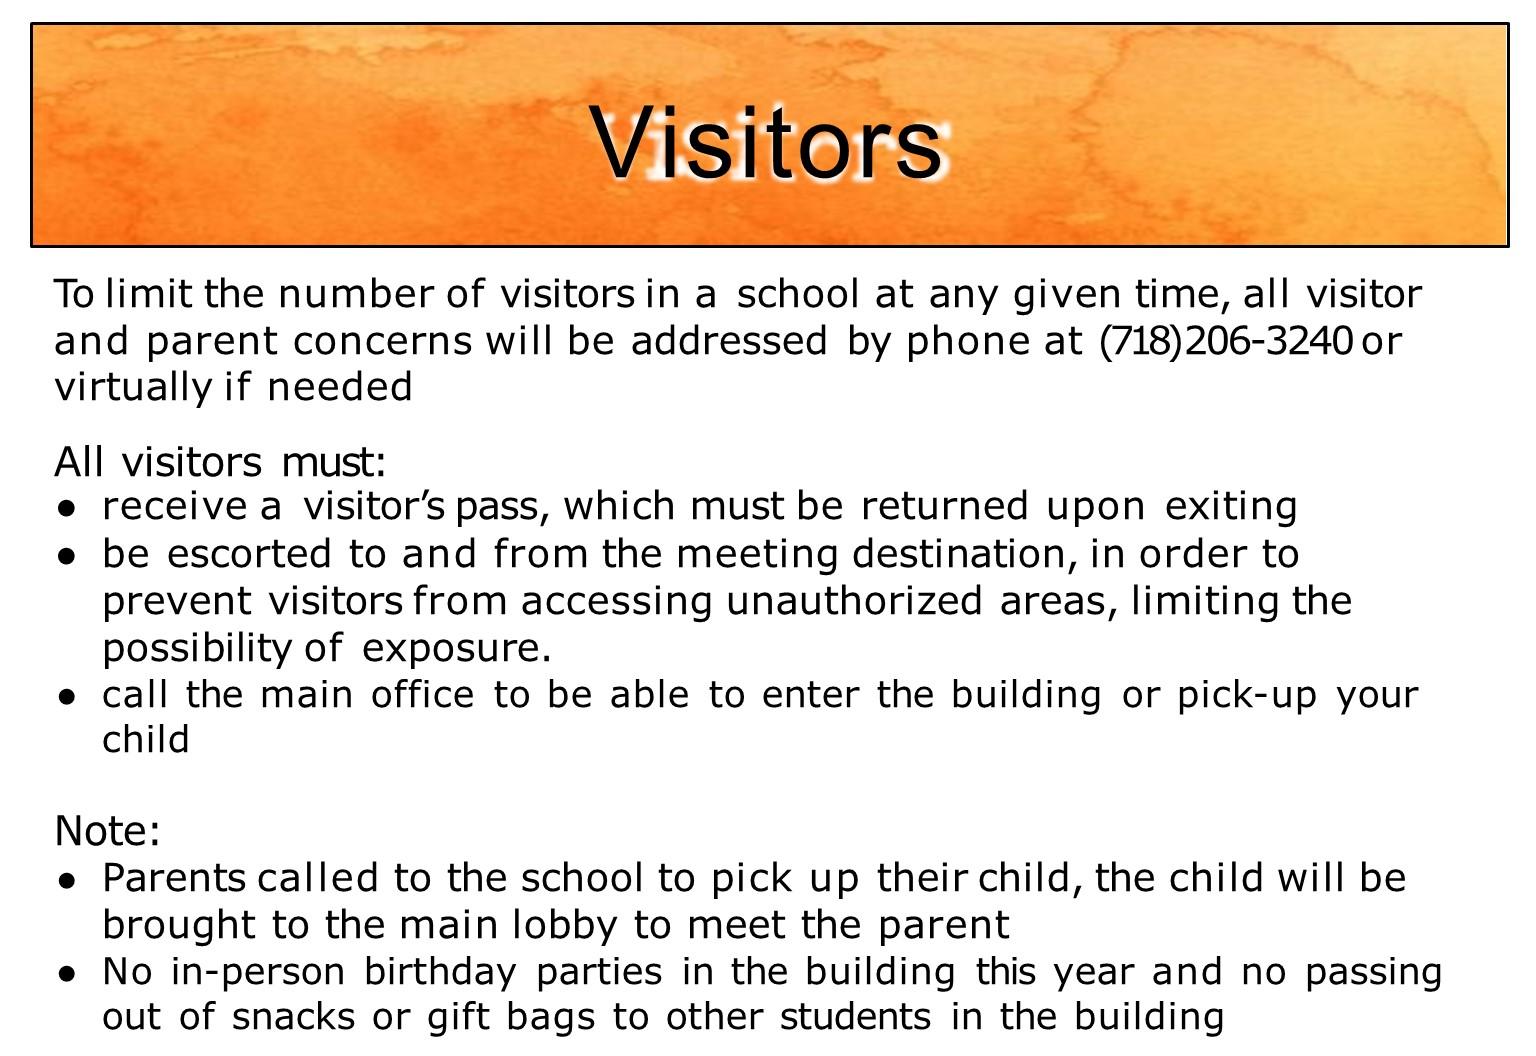 Information on visitation